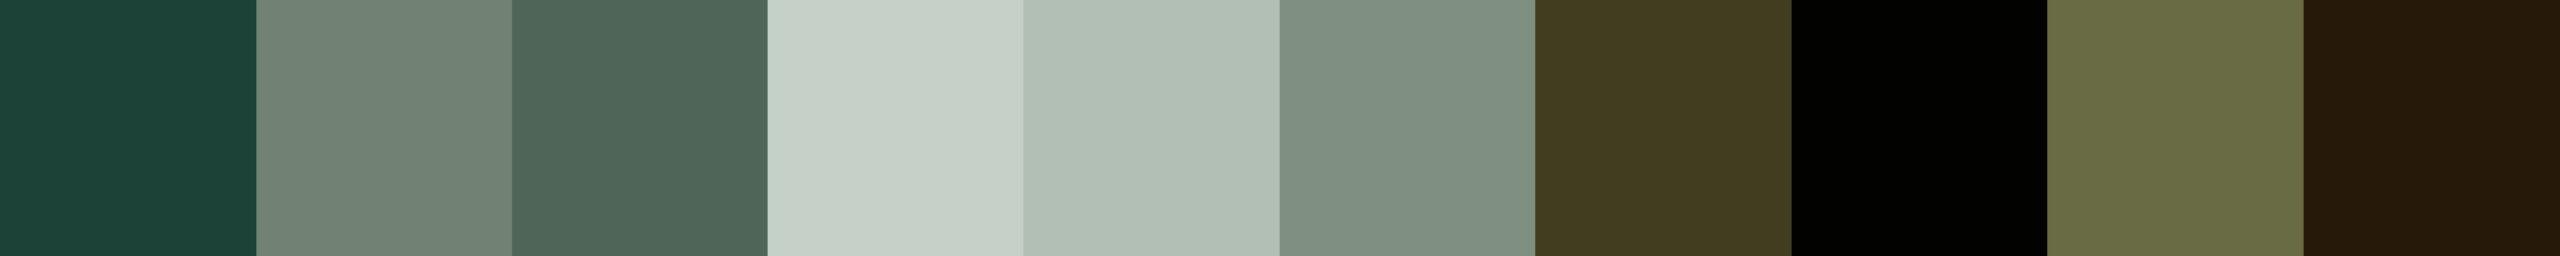 771 Icompia Color Palette